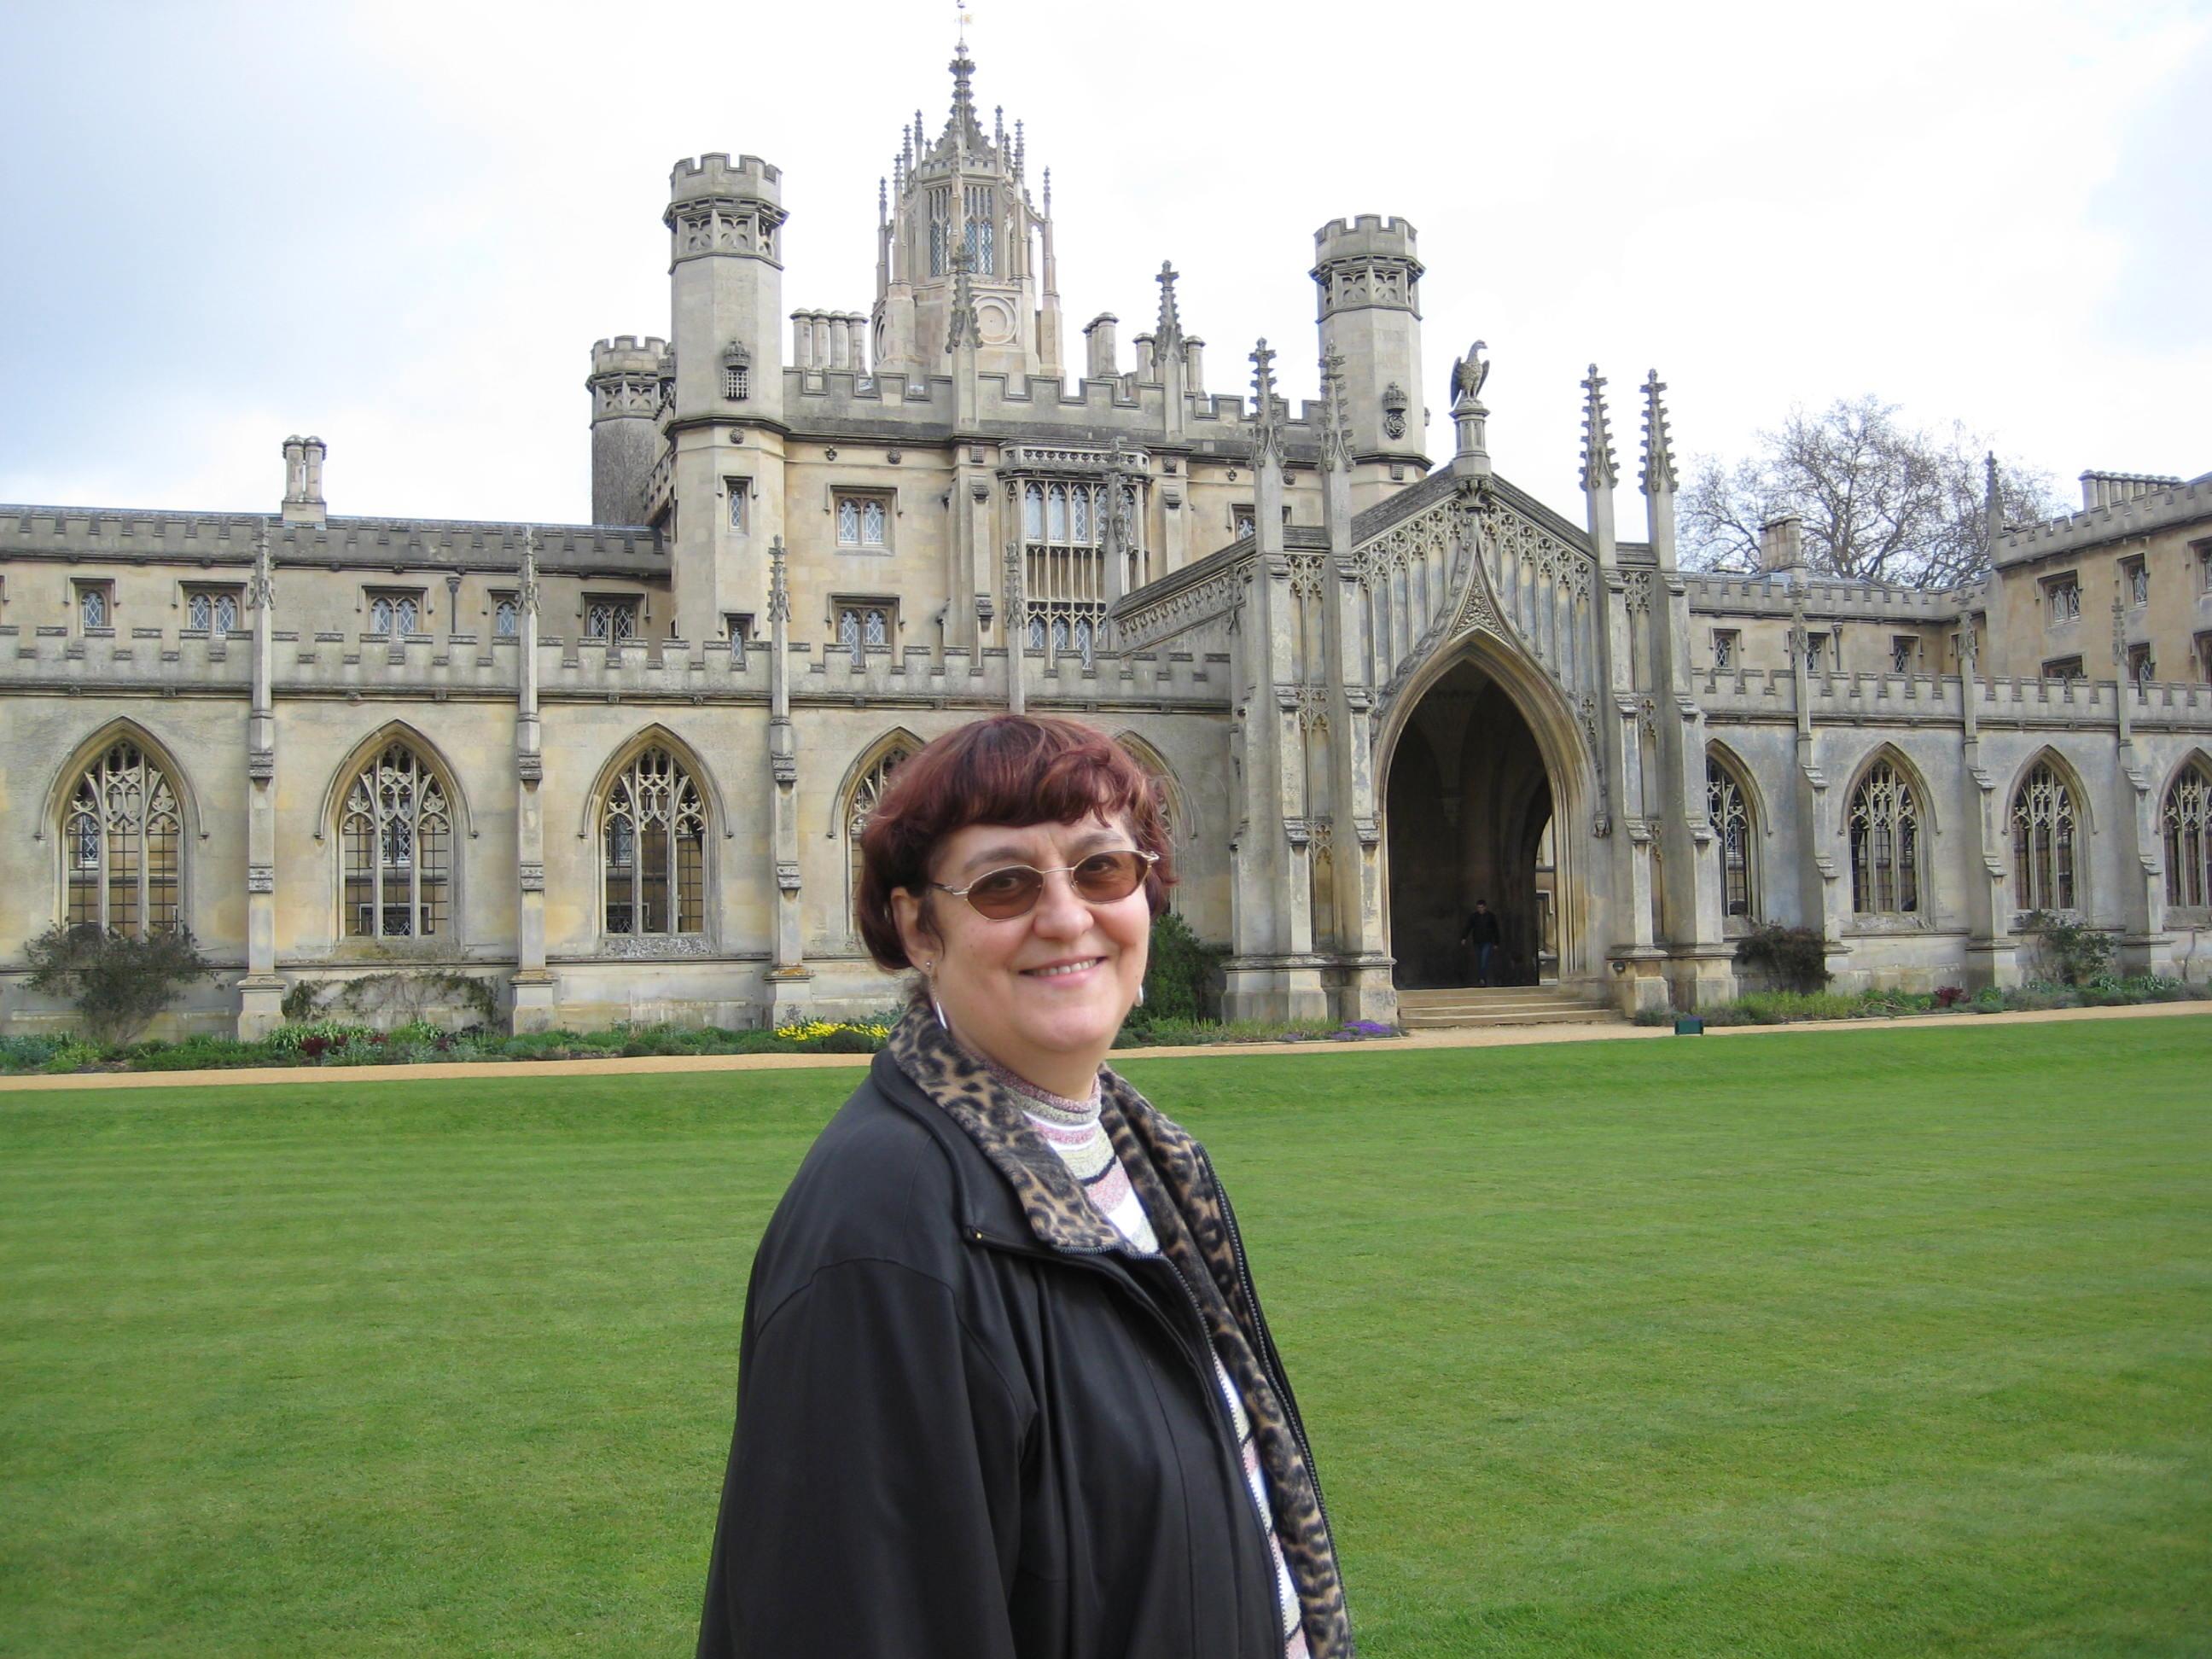 United Kingdom, Cambridge, 2012_43